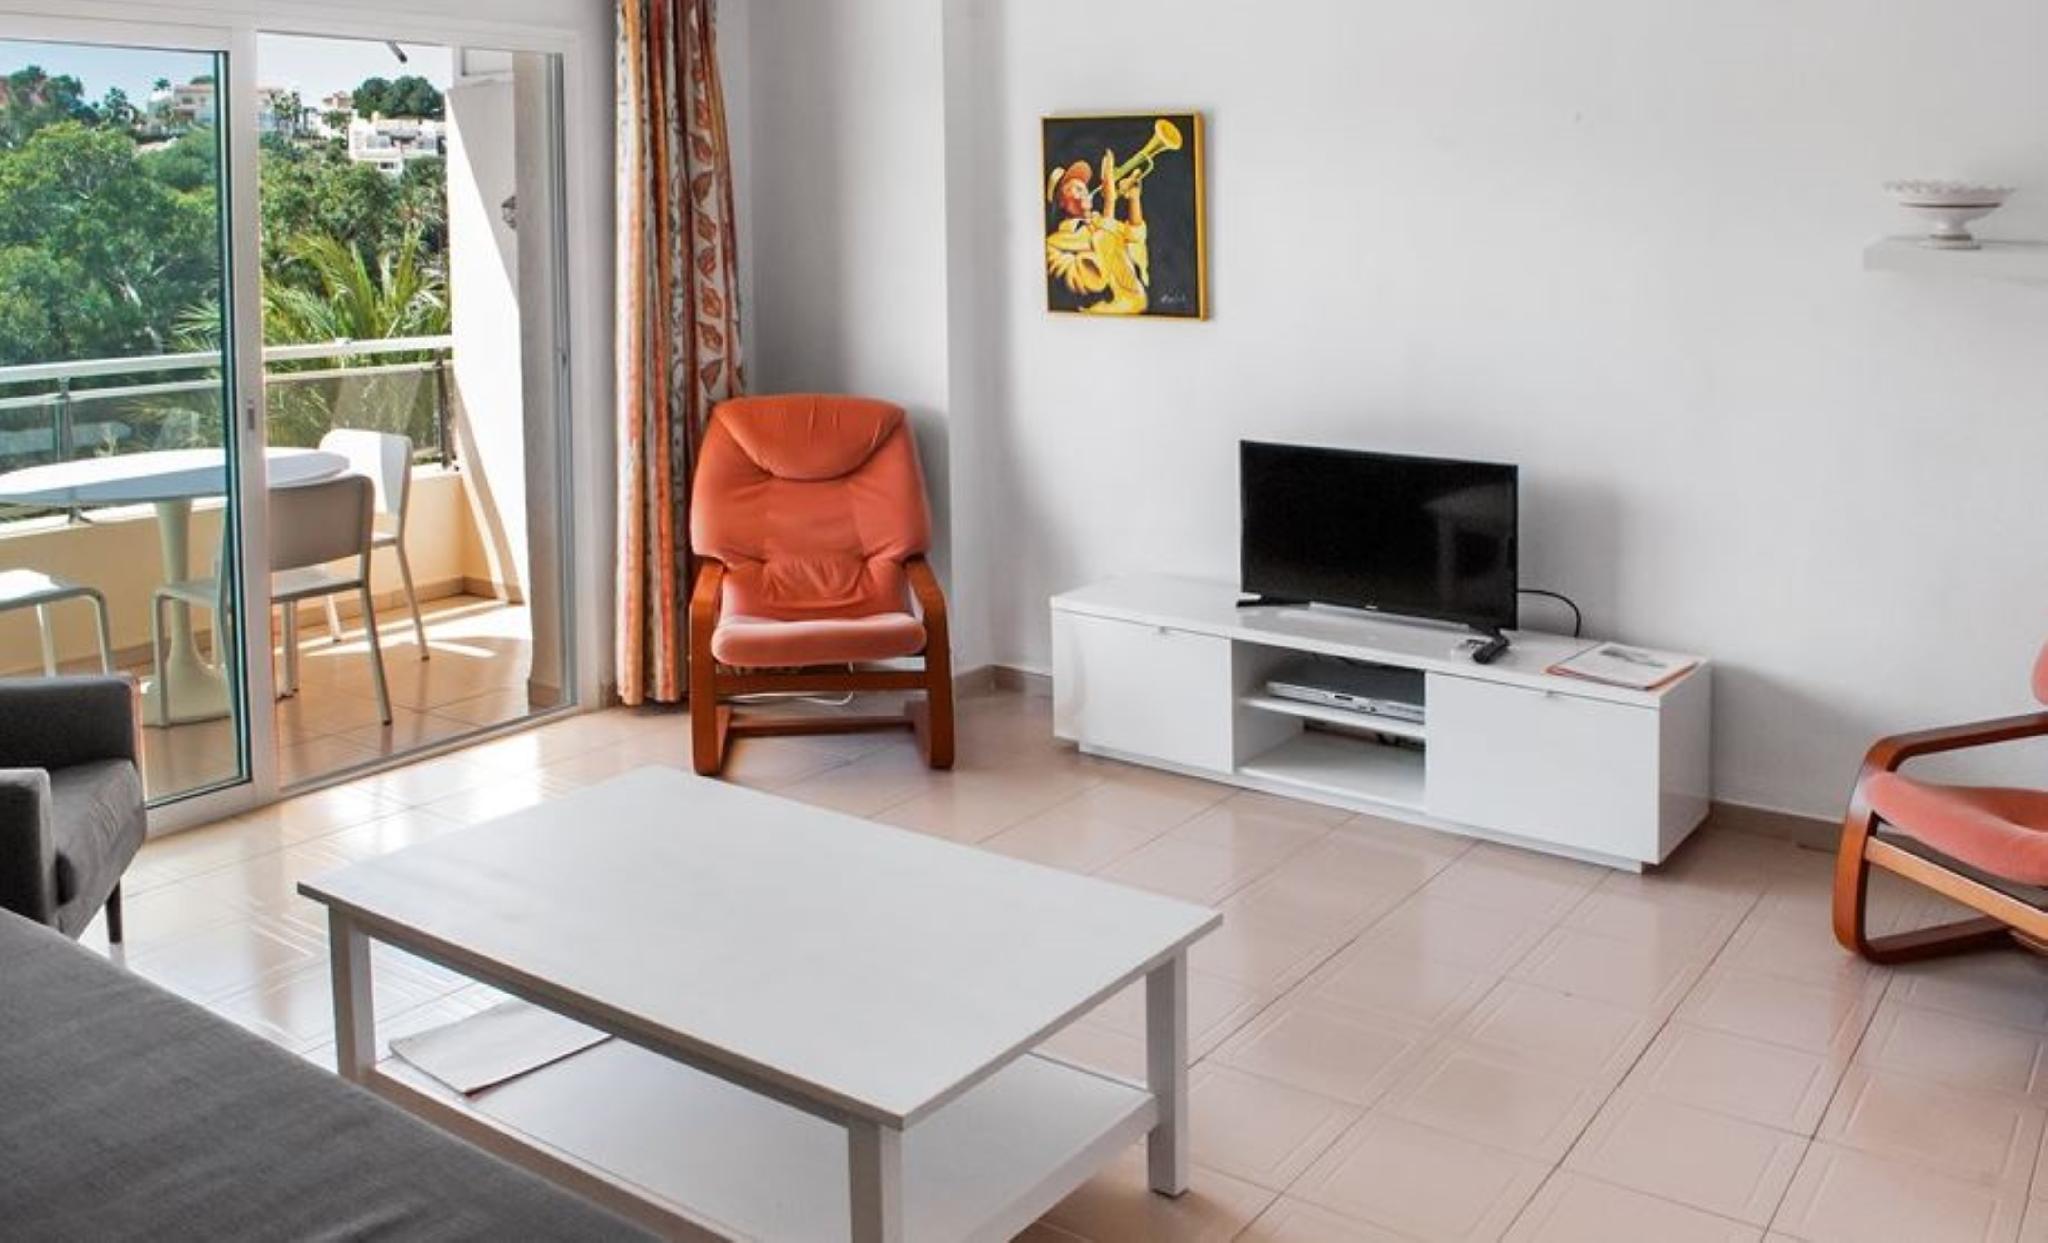 107263   Apartment In Benalmadena